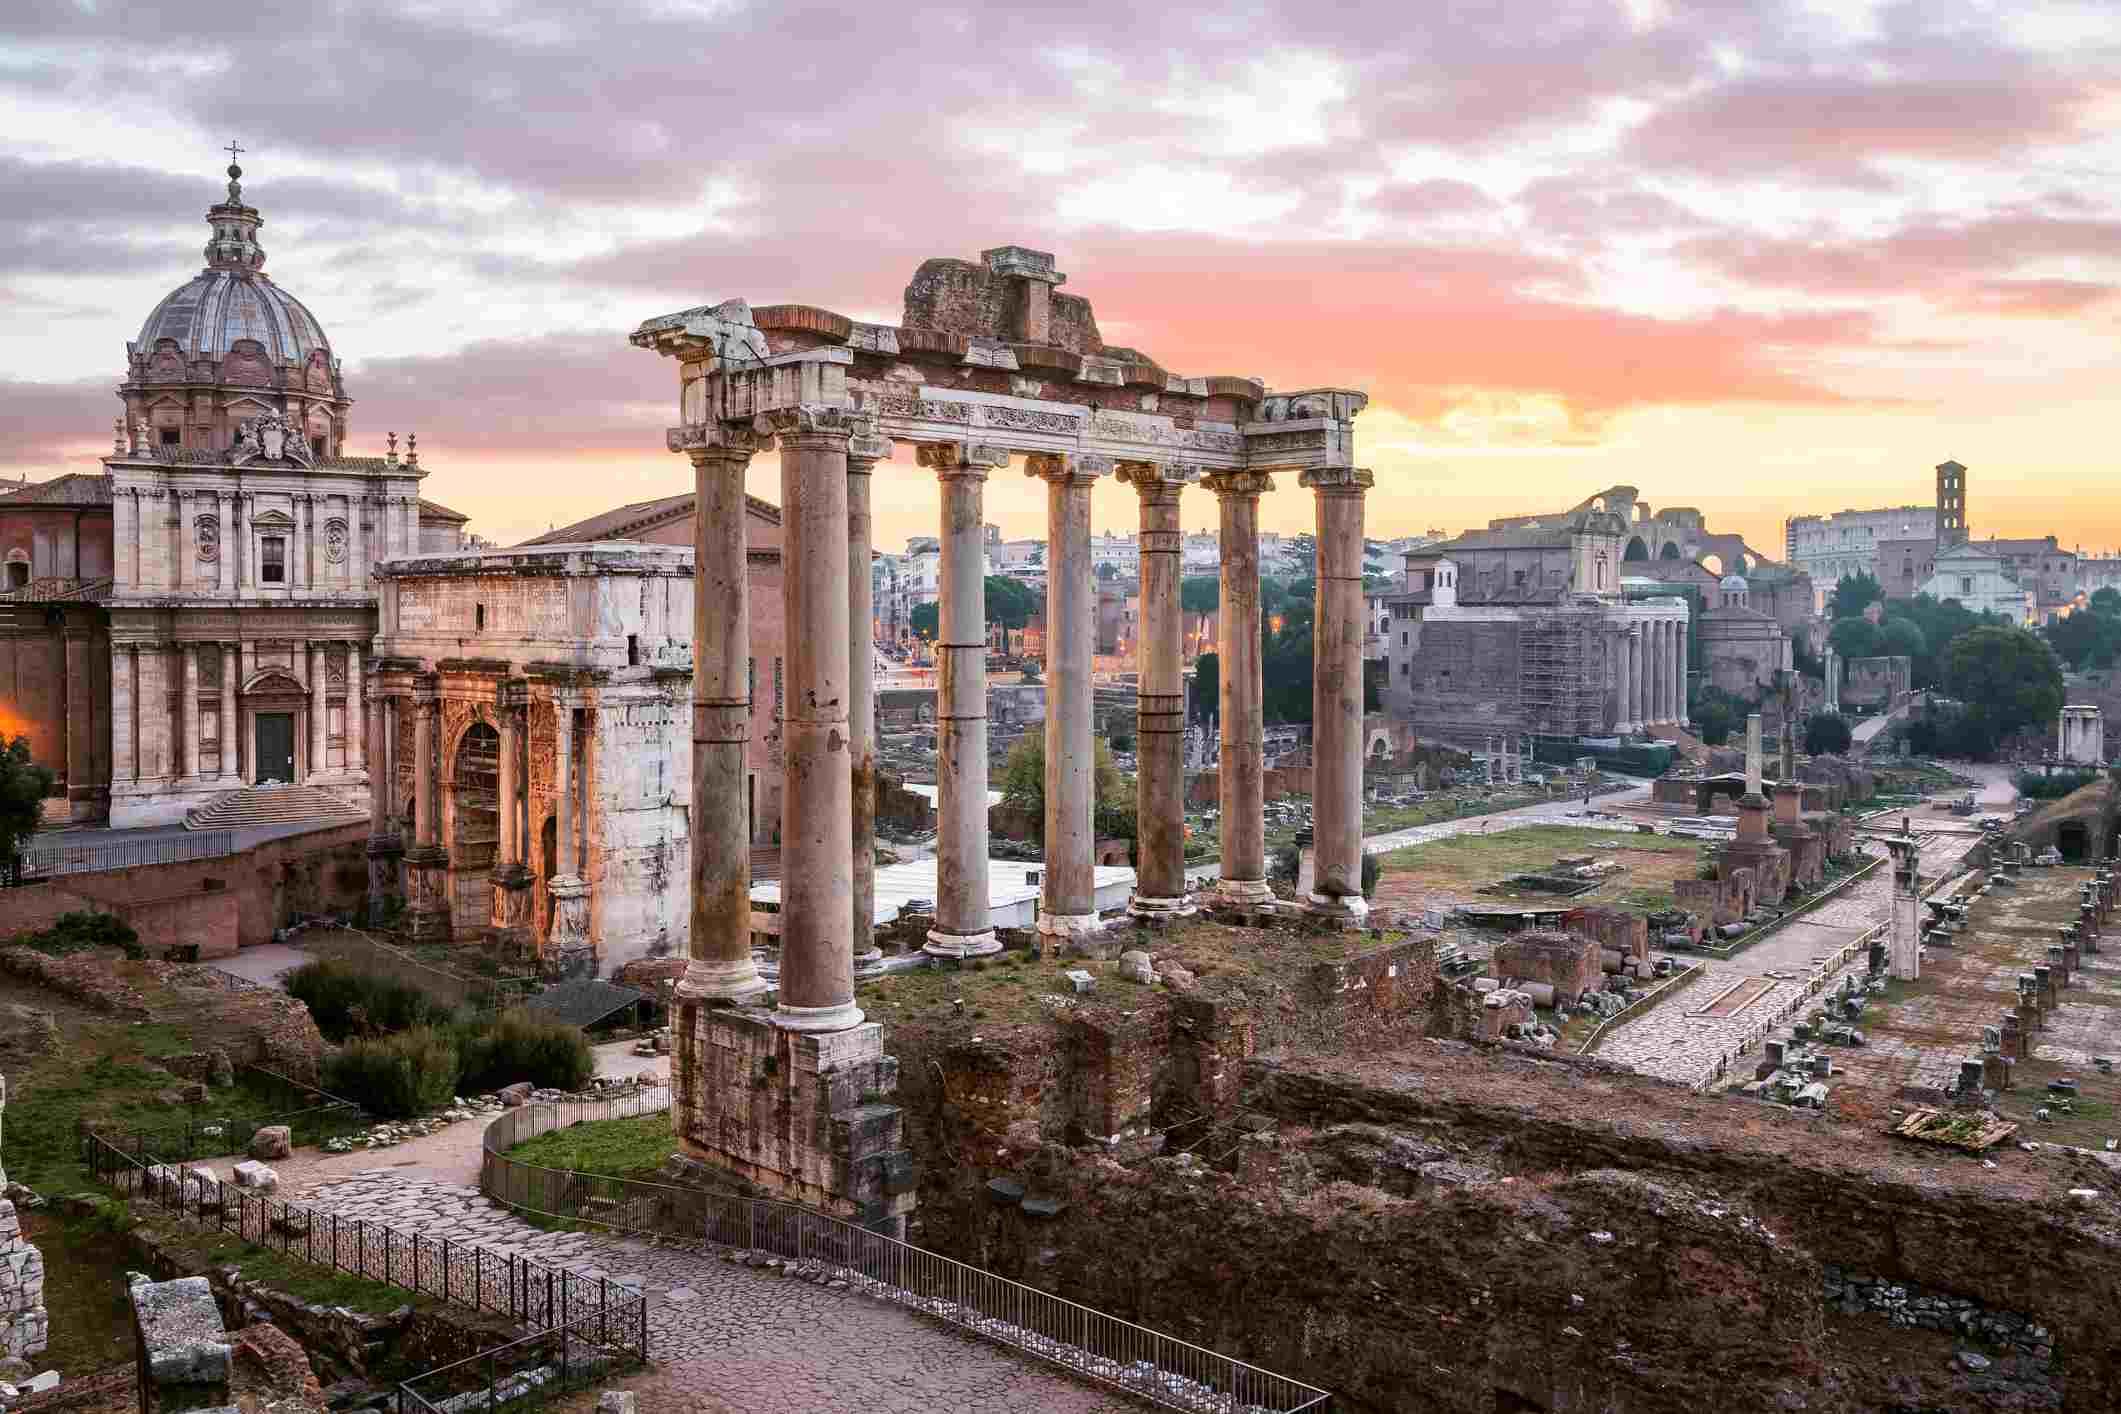 Amanecer, Foro Romano, Roma, Italia